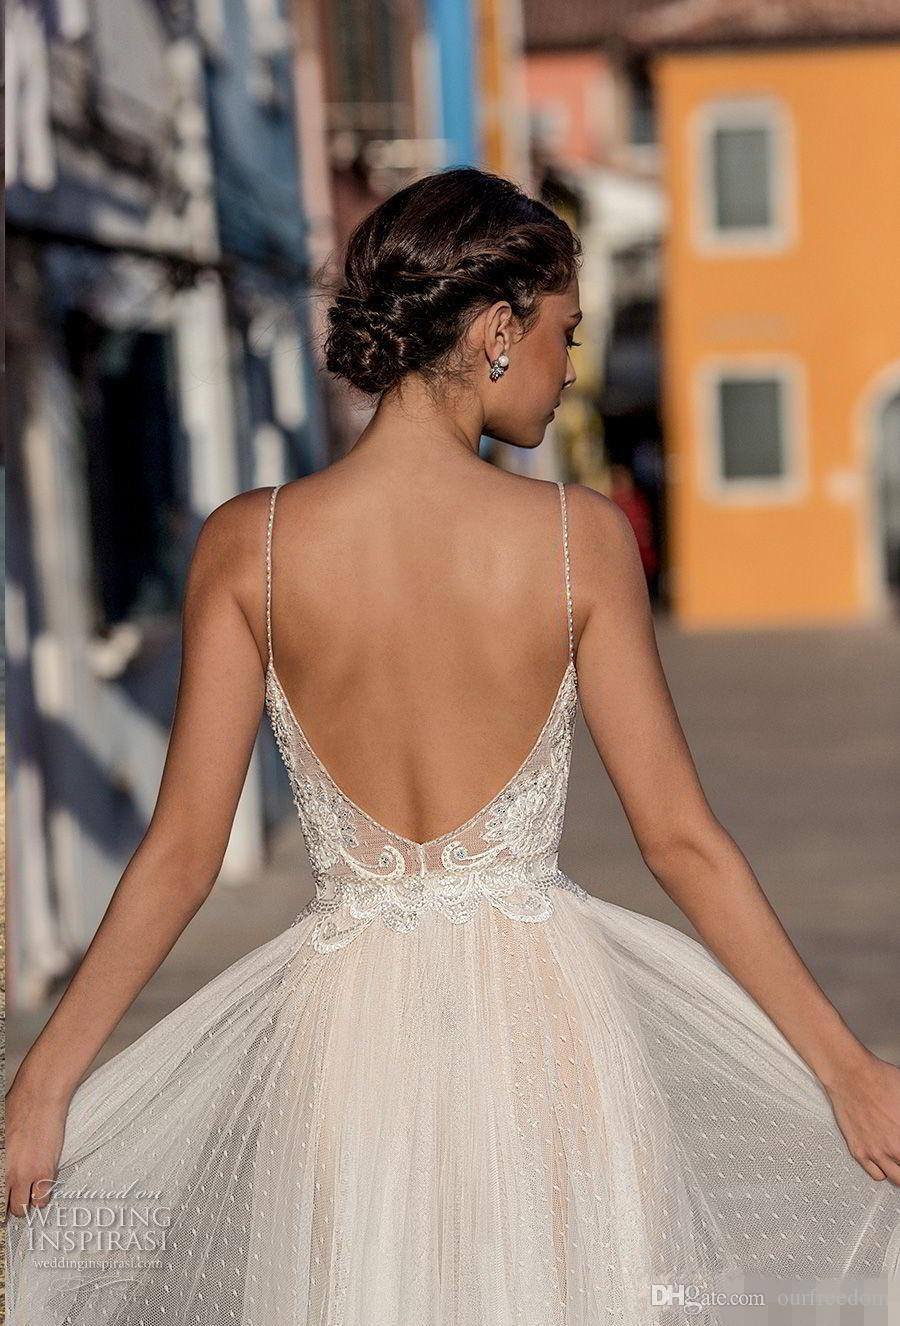 2020 New Sexy Gali Karten Garden Beach Wedding Dresses Sleeveless Spaghetti Straps Robe De Soiree Backless Long Boho Brdial Gowns